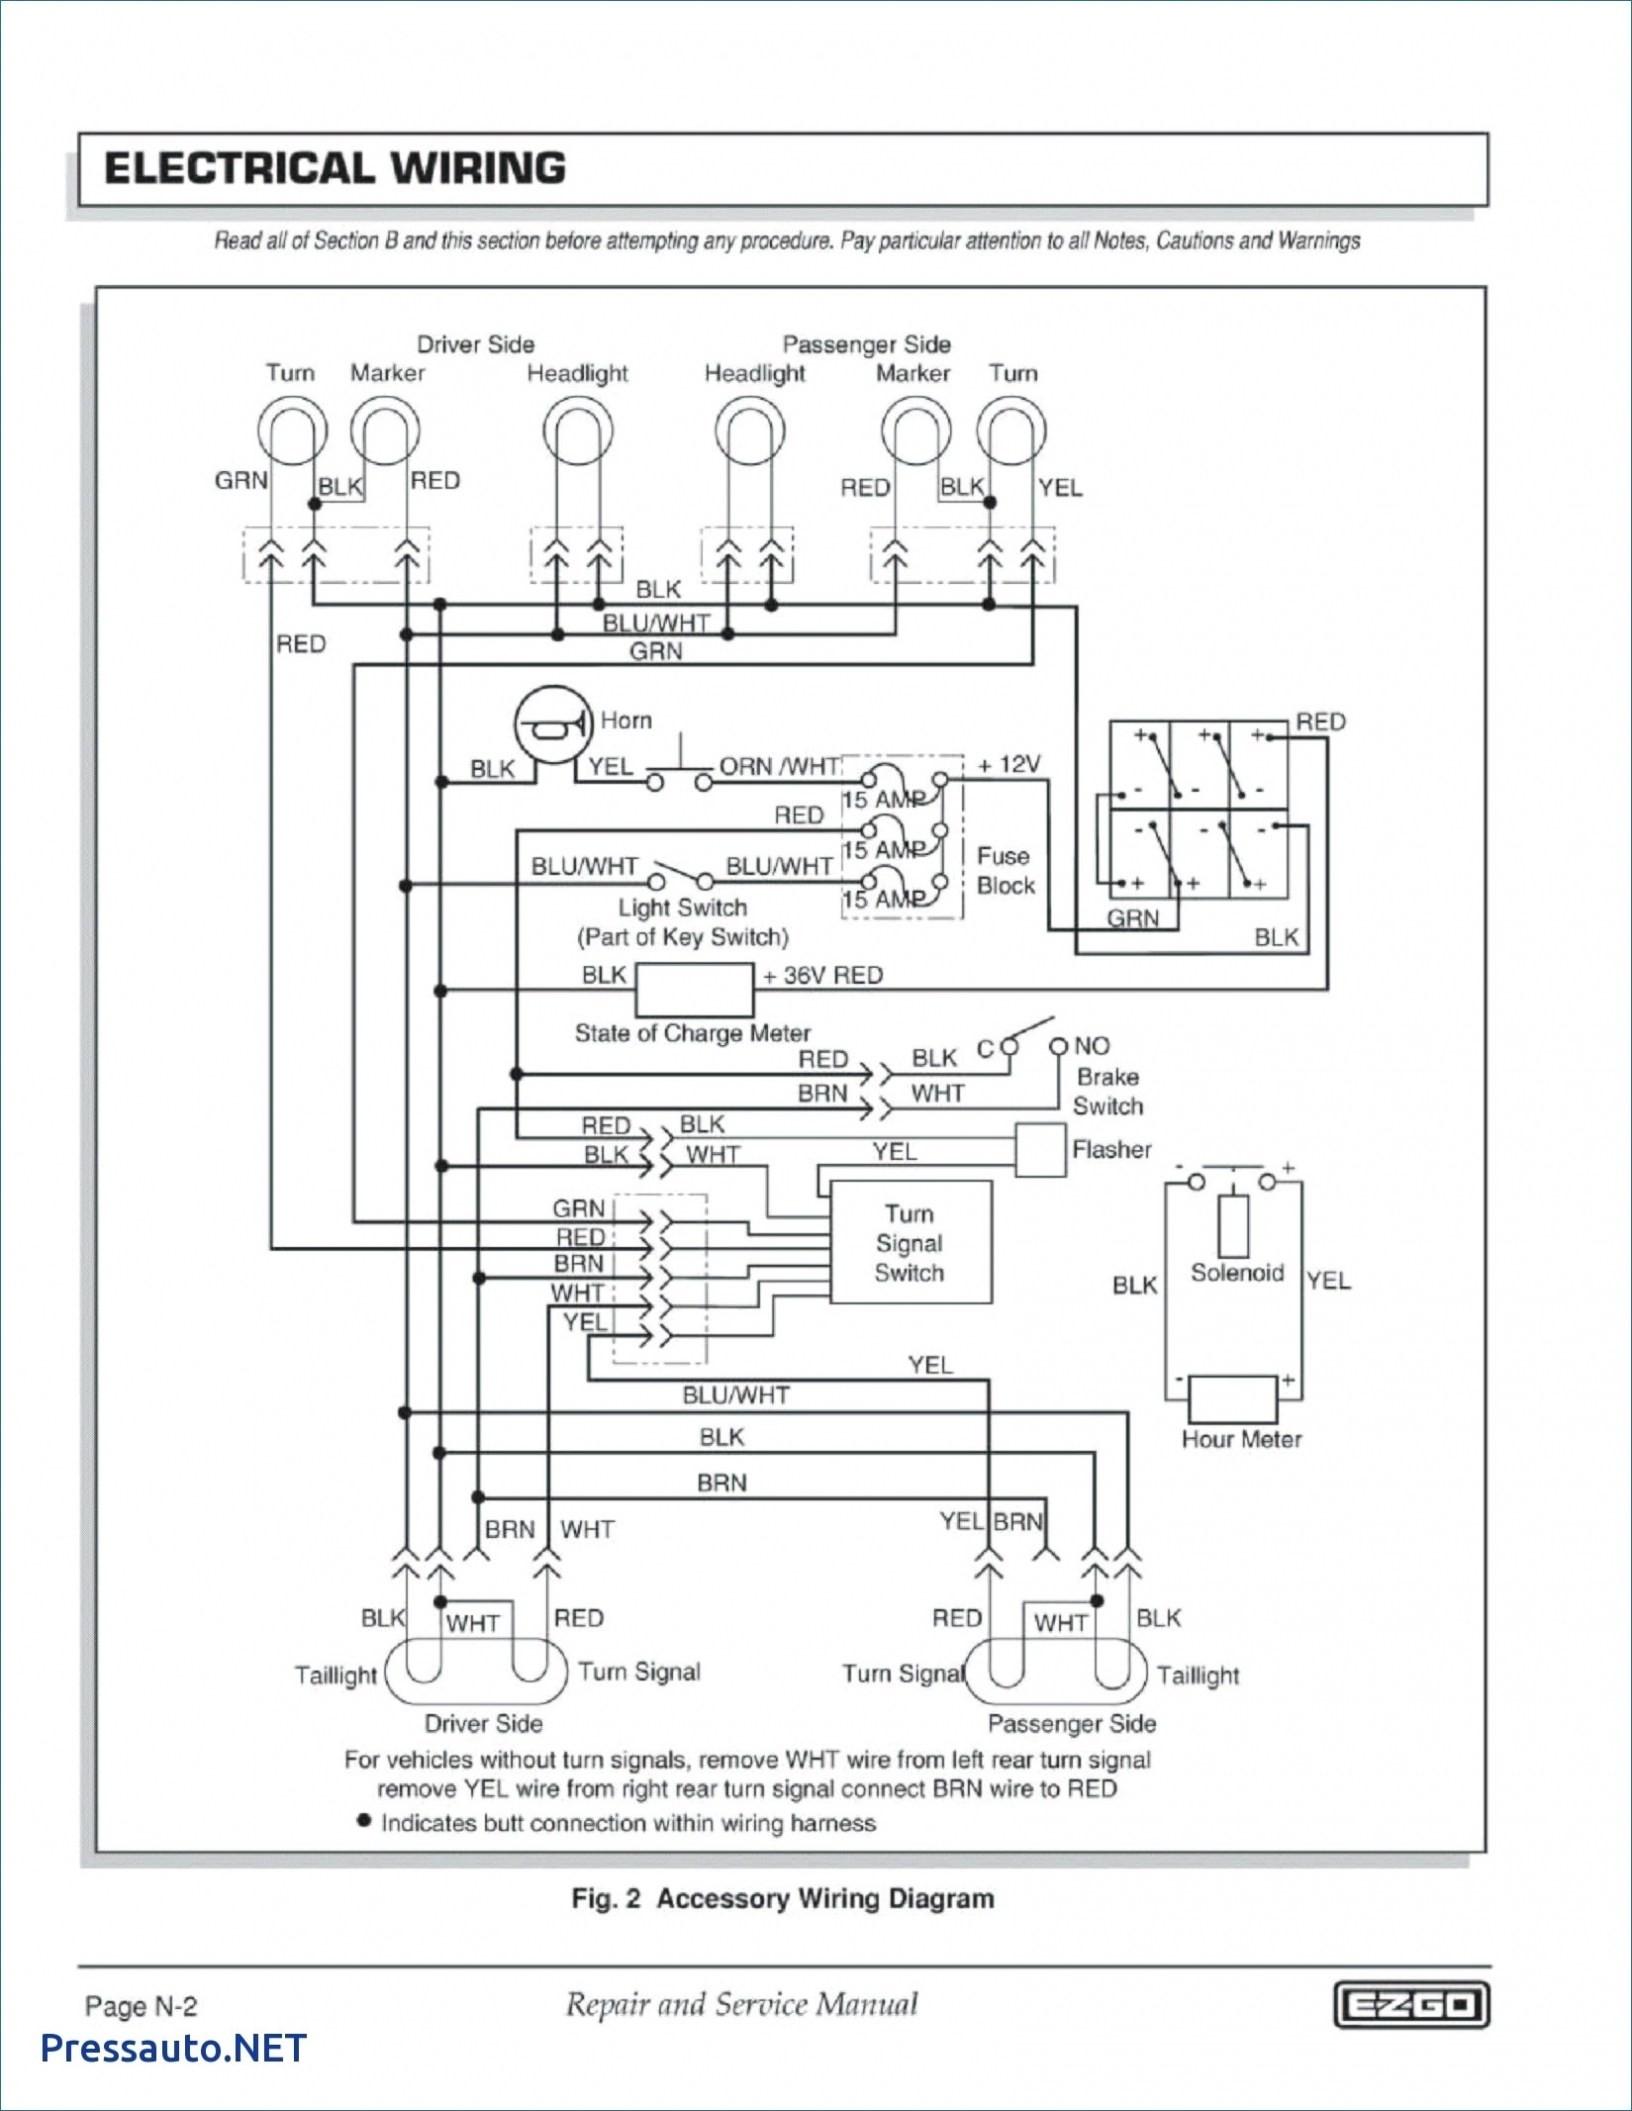 ez go gas golf cart wiring diagram pdf ezgo golf cart wiring diagram pics